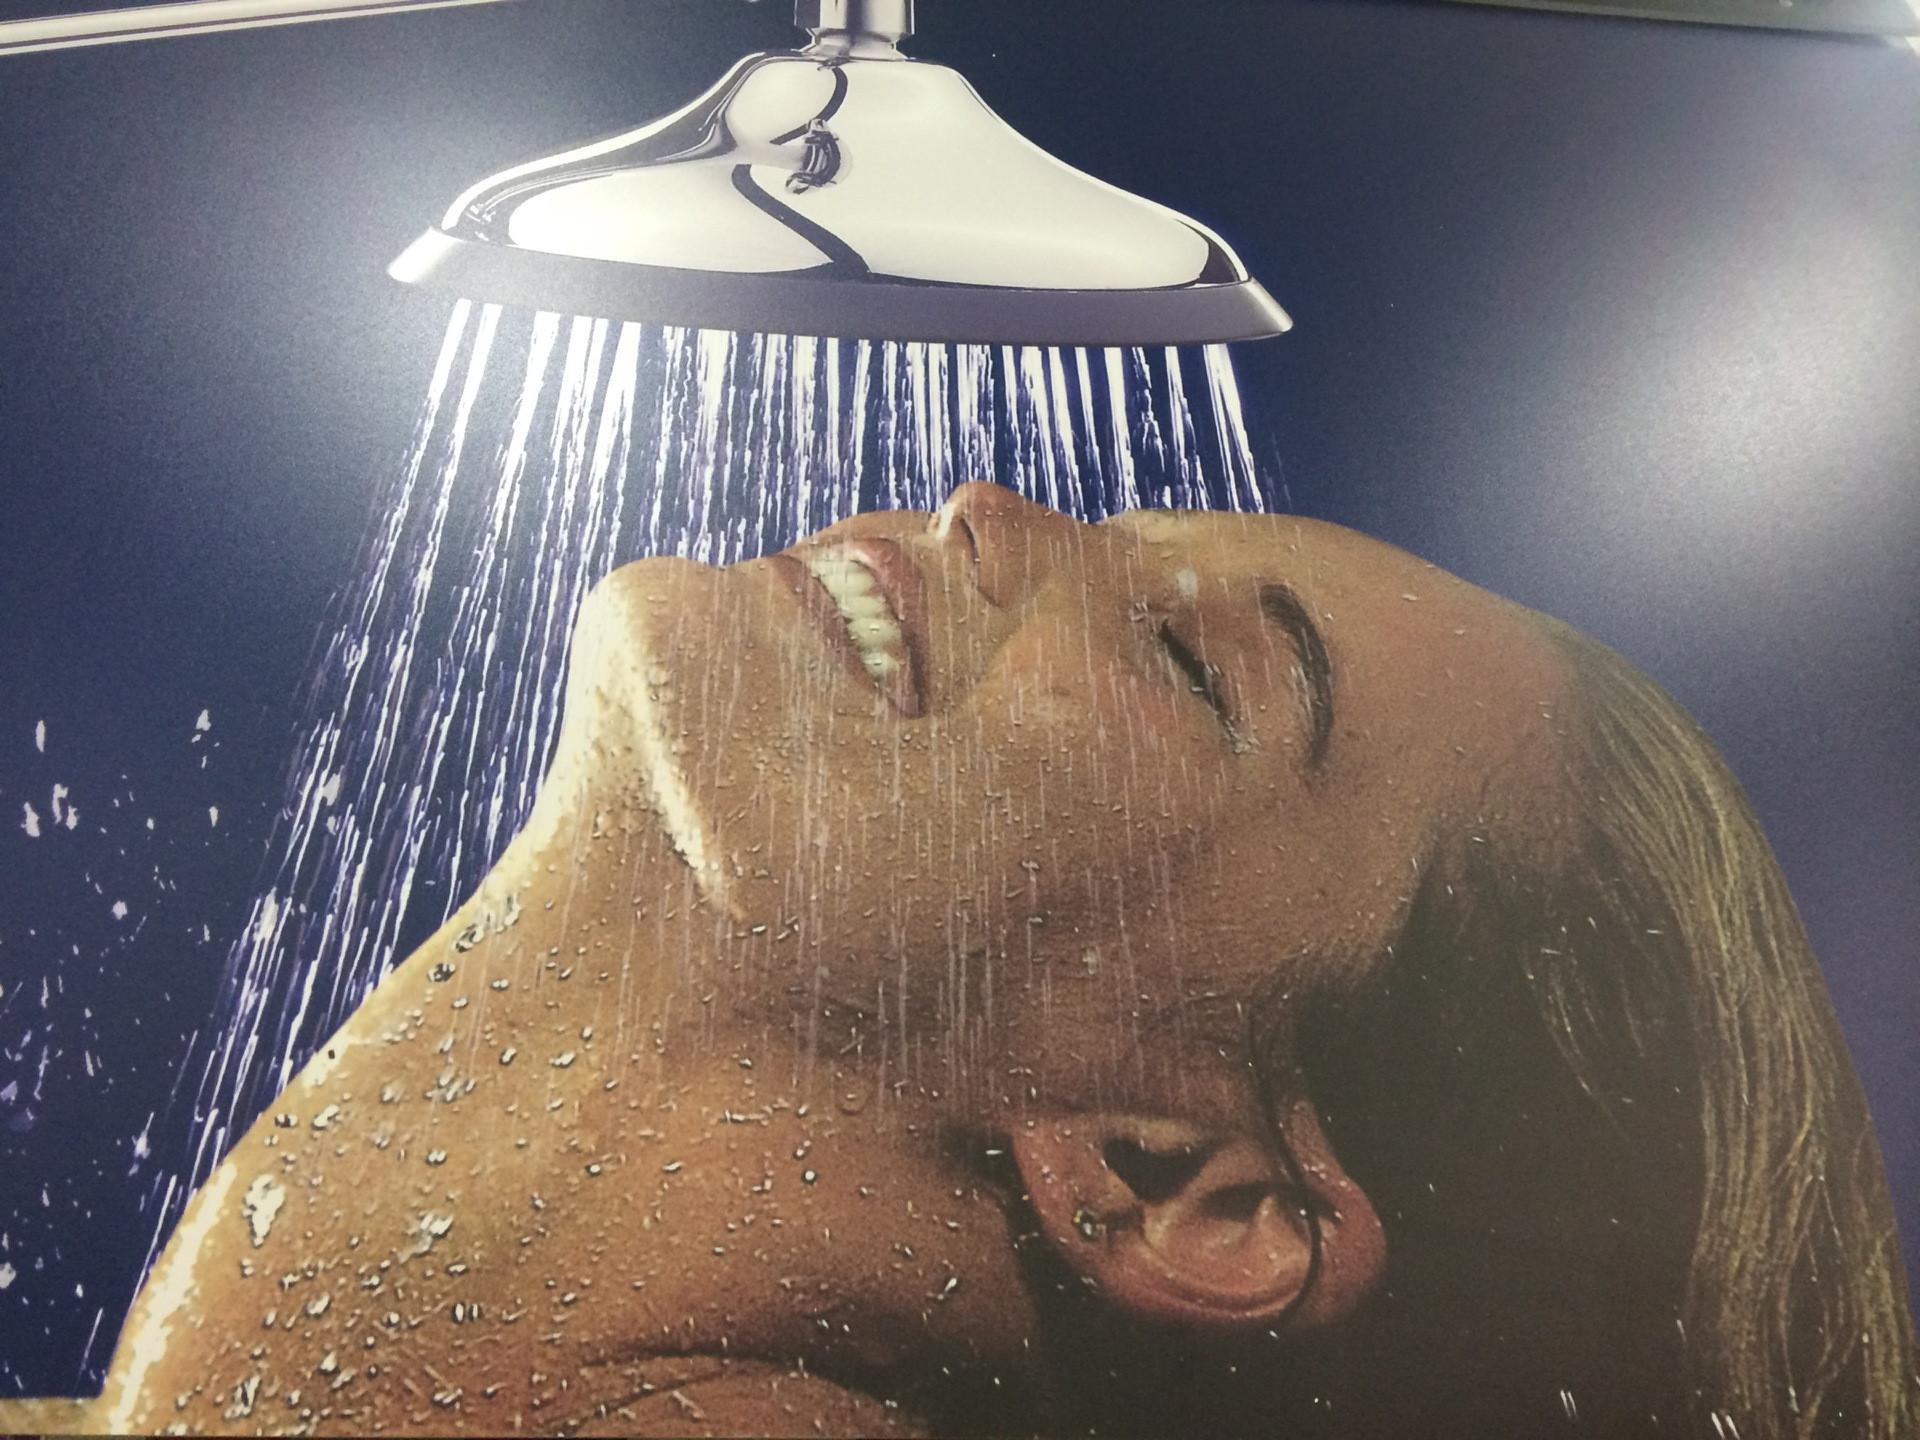 Finally! a shower for when I break my neck.